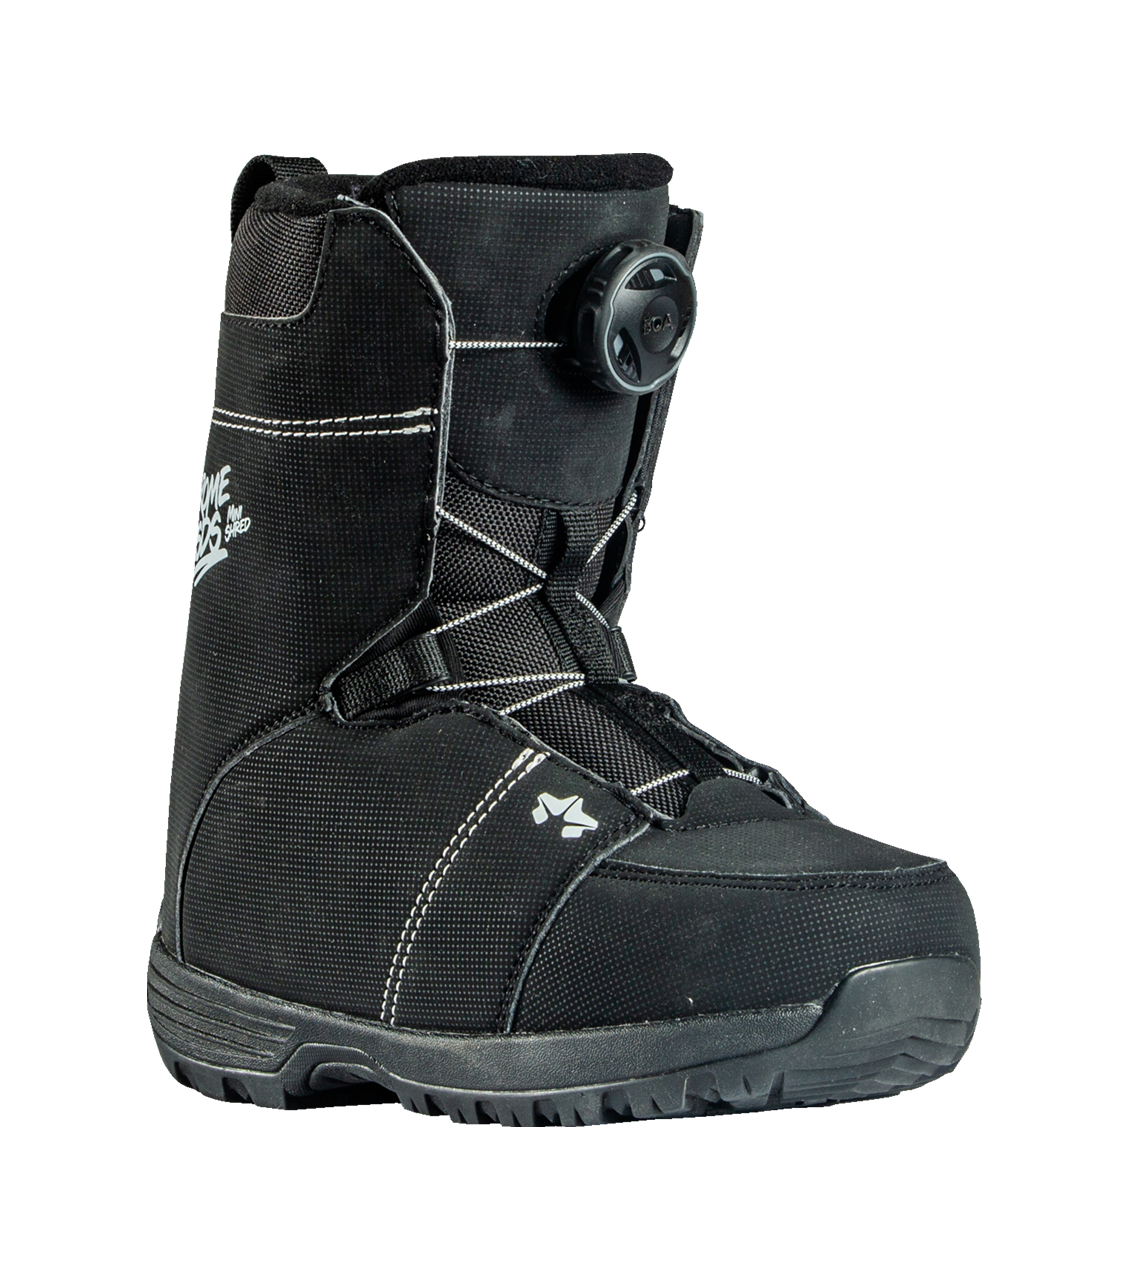 Rome Minishred Snowboard Boots 2021